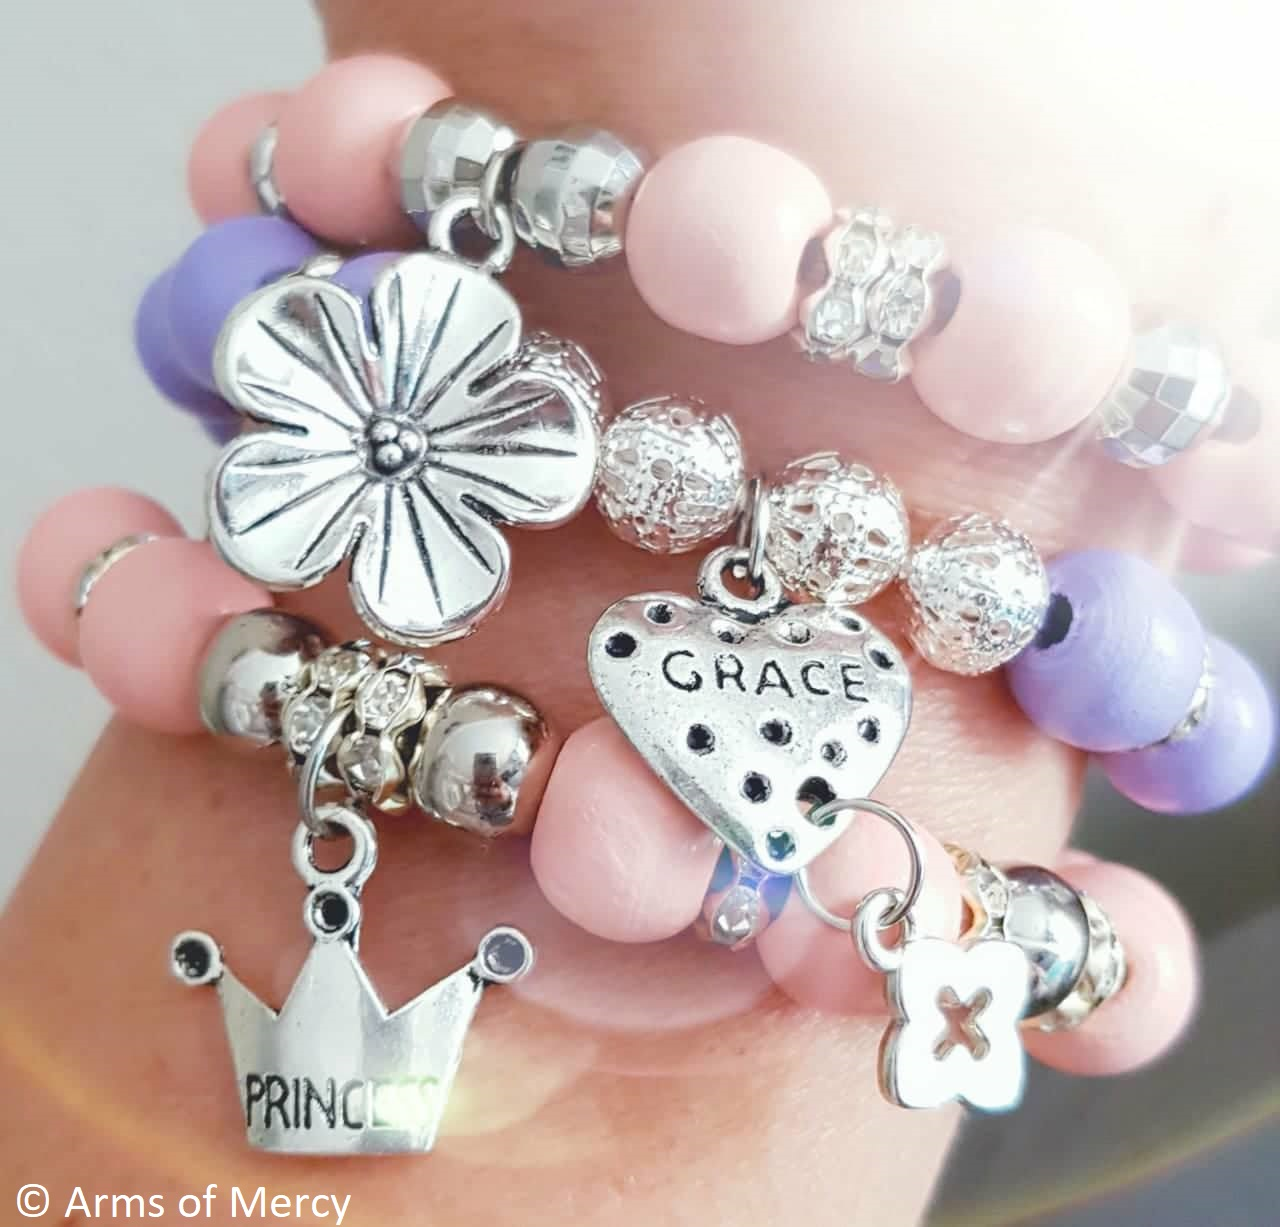 Arms of Mercy - Princess Blossom Bracelets for Mihla Engelbrecht